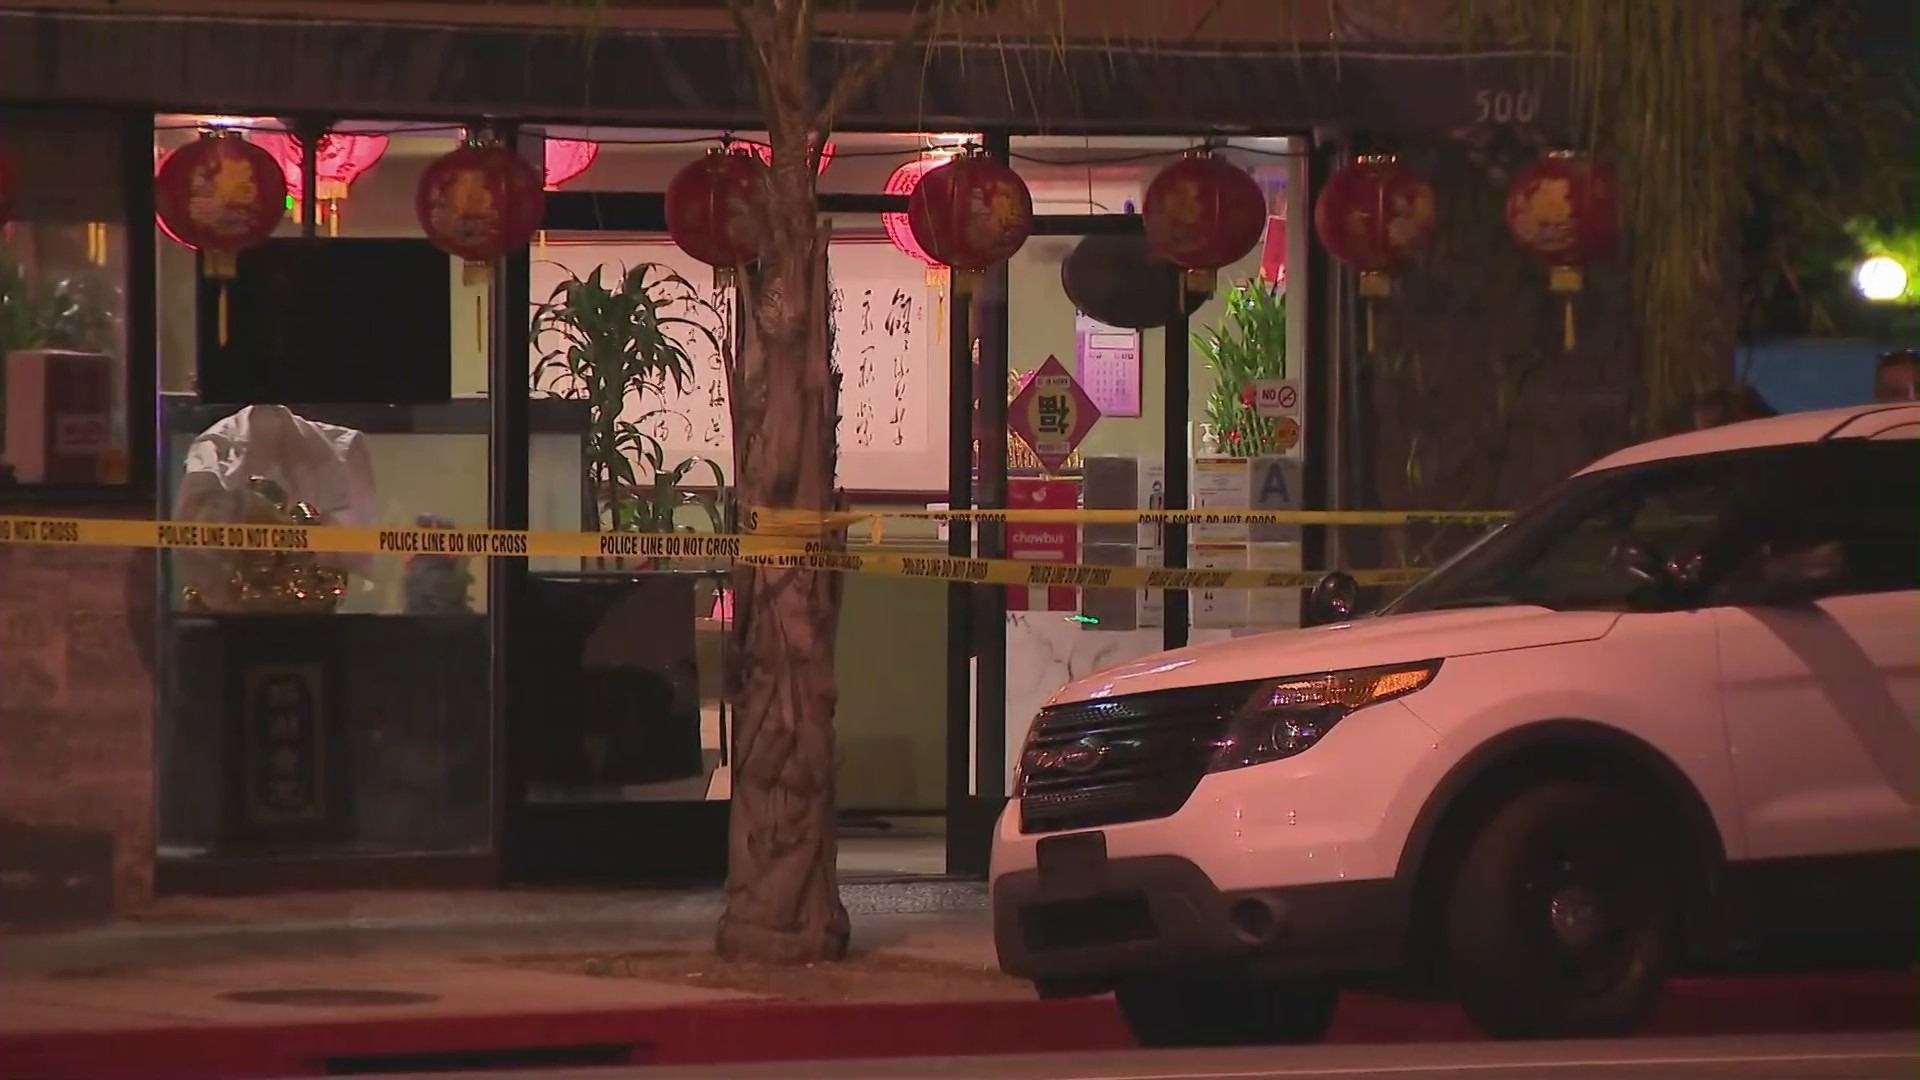 Authorities investigate a double homicide in Monterey Park on April 6, 2021. (KTLA)